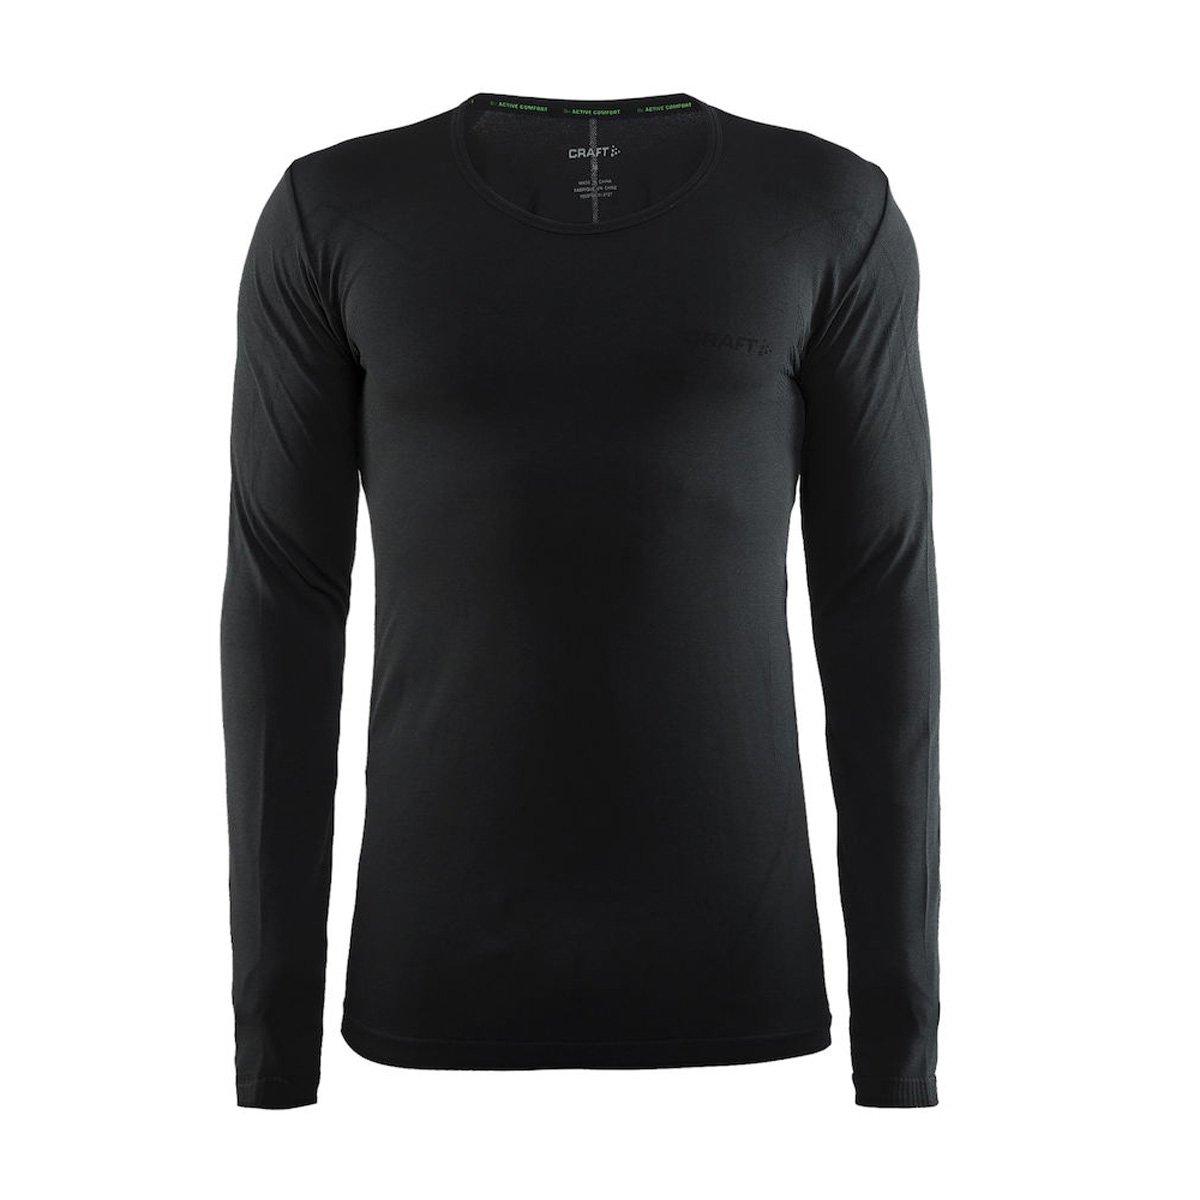 Craft 2016/17 Men's Active Comfort RN Long Sleeve Base Layer - 1903716 (Black Solid - XL)